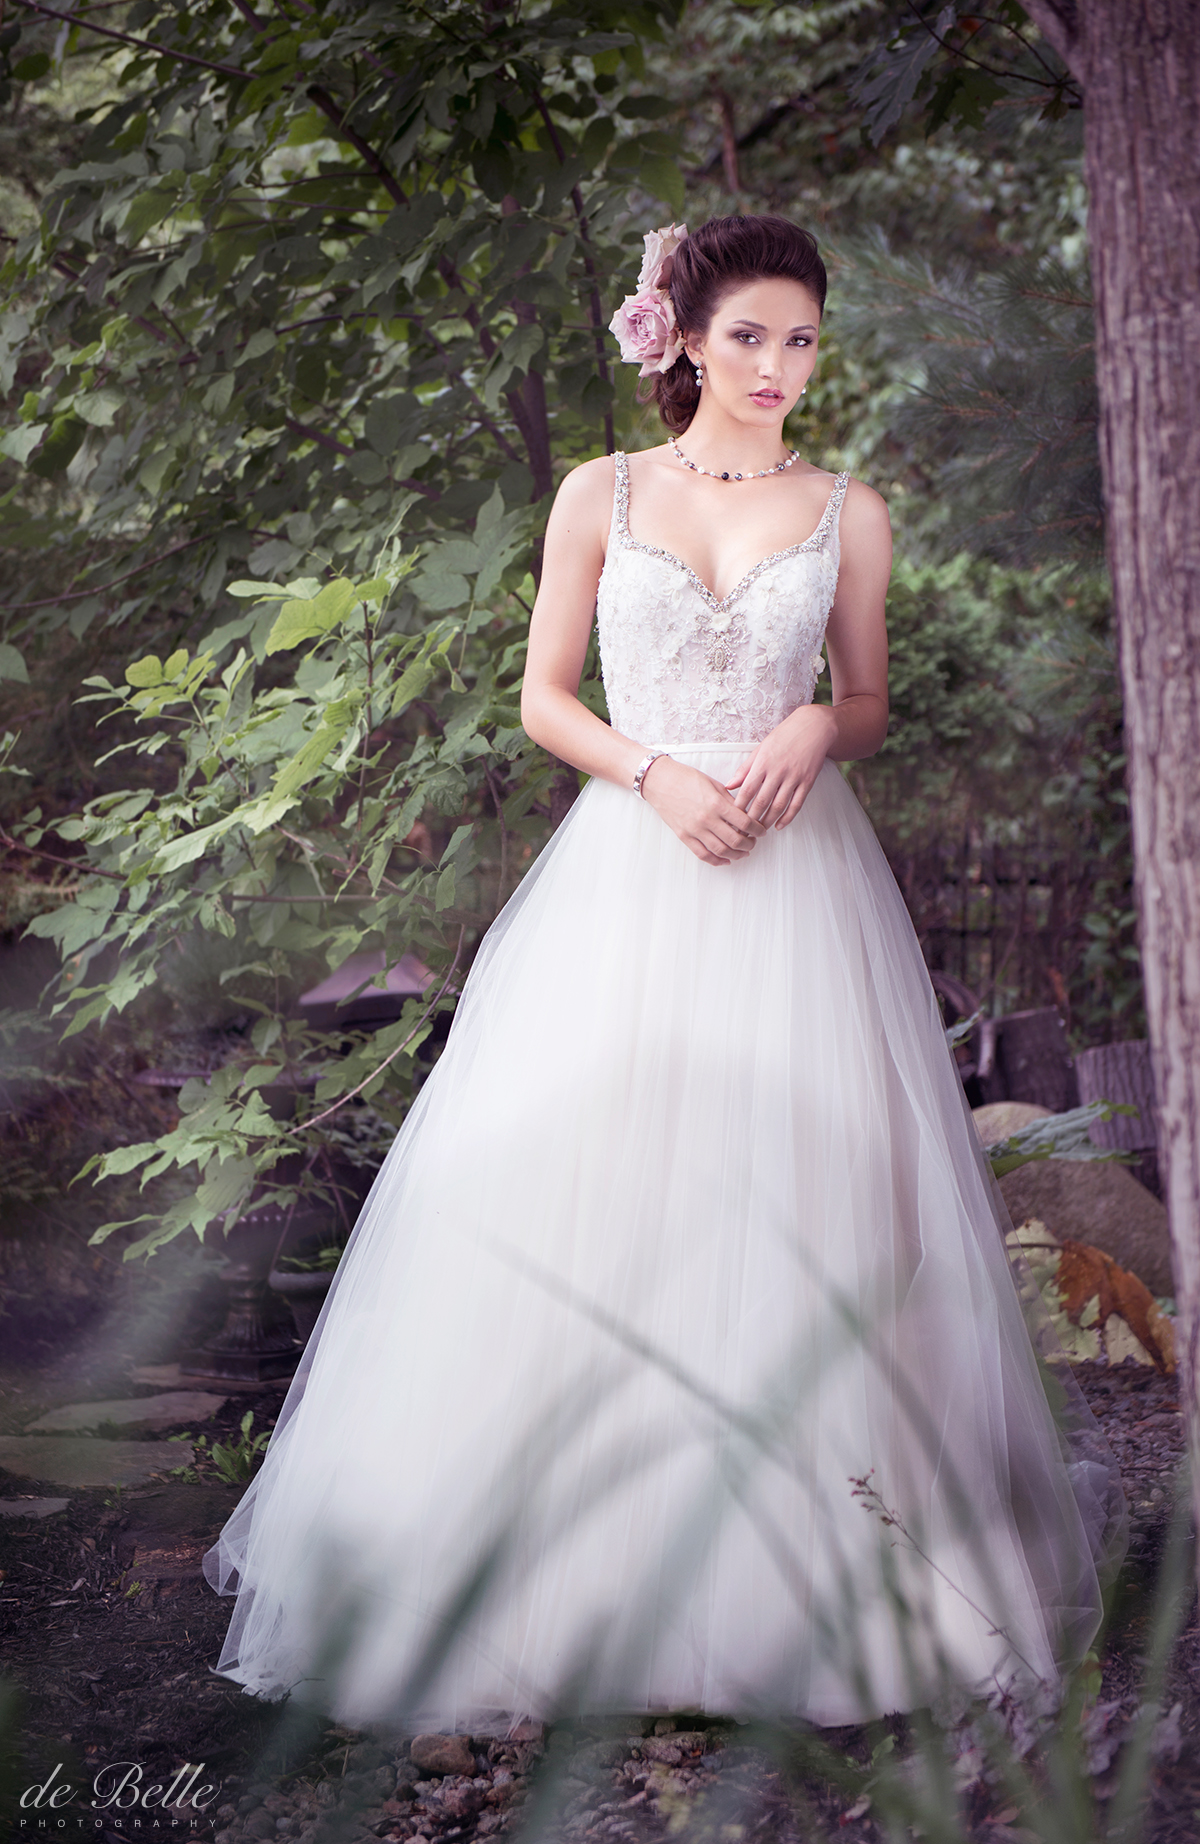 Montreal-Wedding-Photographer-Debelle-EW6